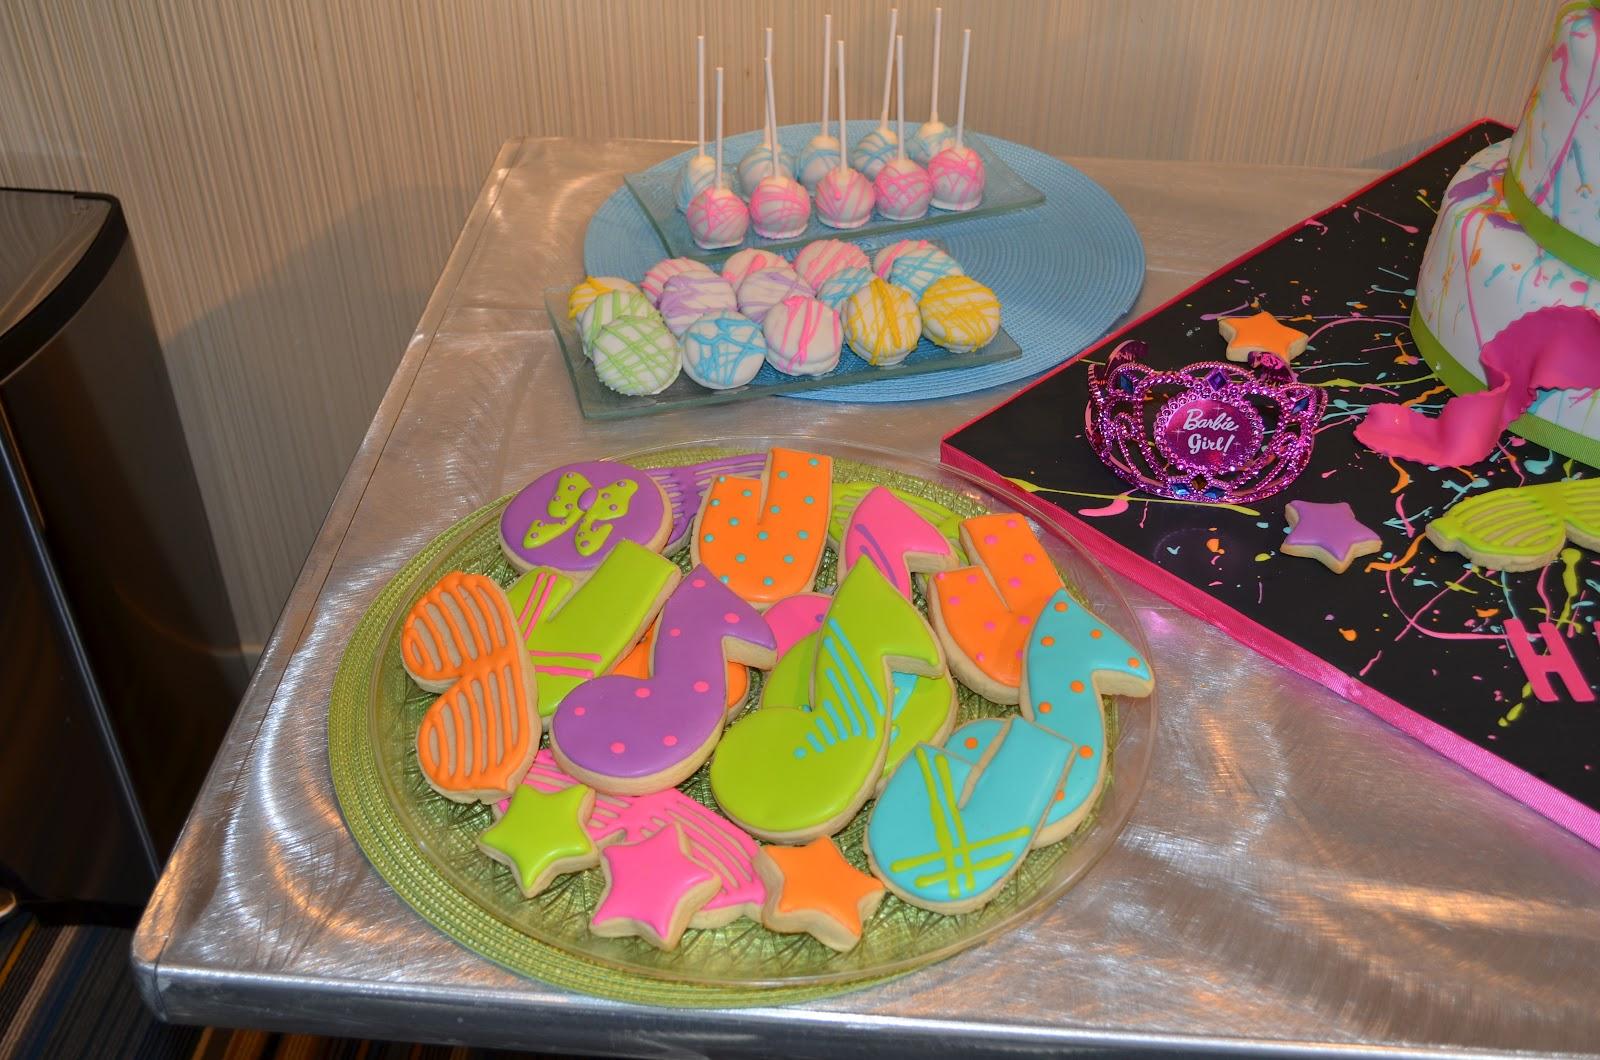 S Amore Cake Nicki Minaj Themed 4th Birthday Party